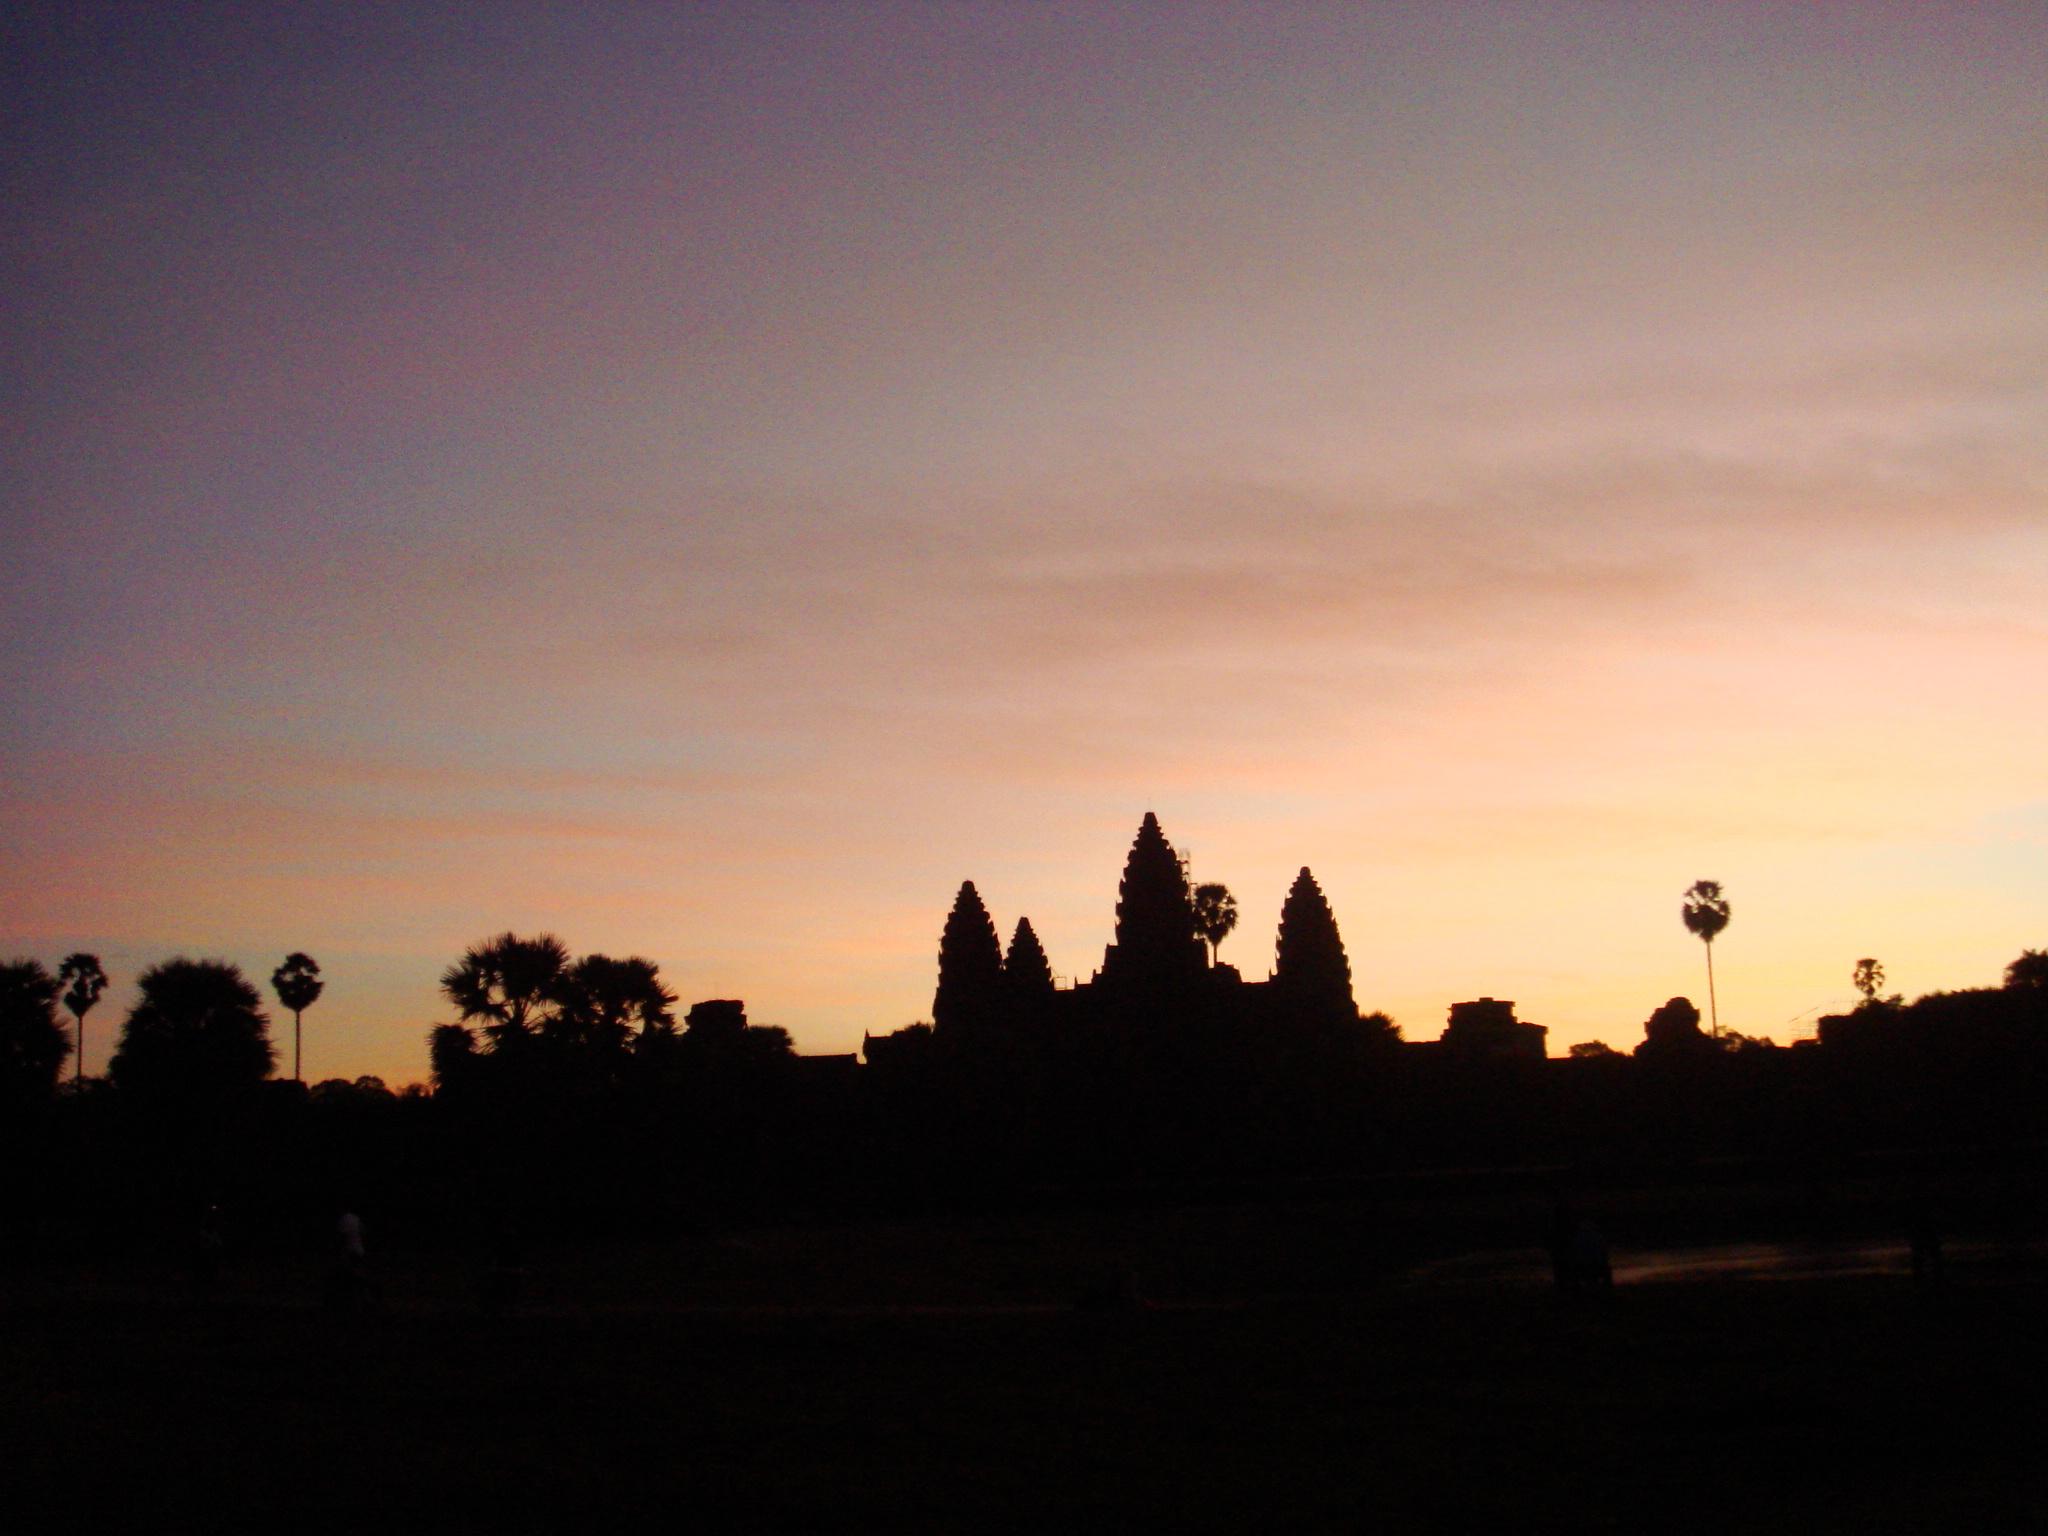 Angkor Wat @ dawn Angkor Wat - Cambodia Paul Fenton